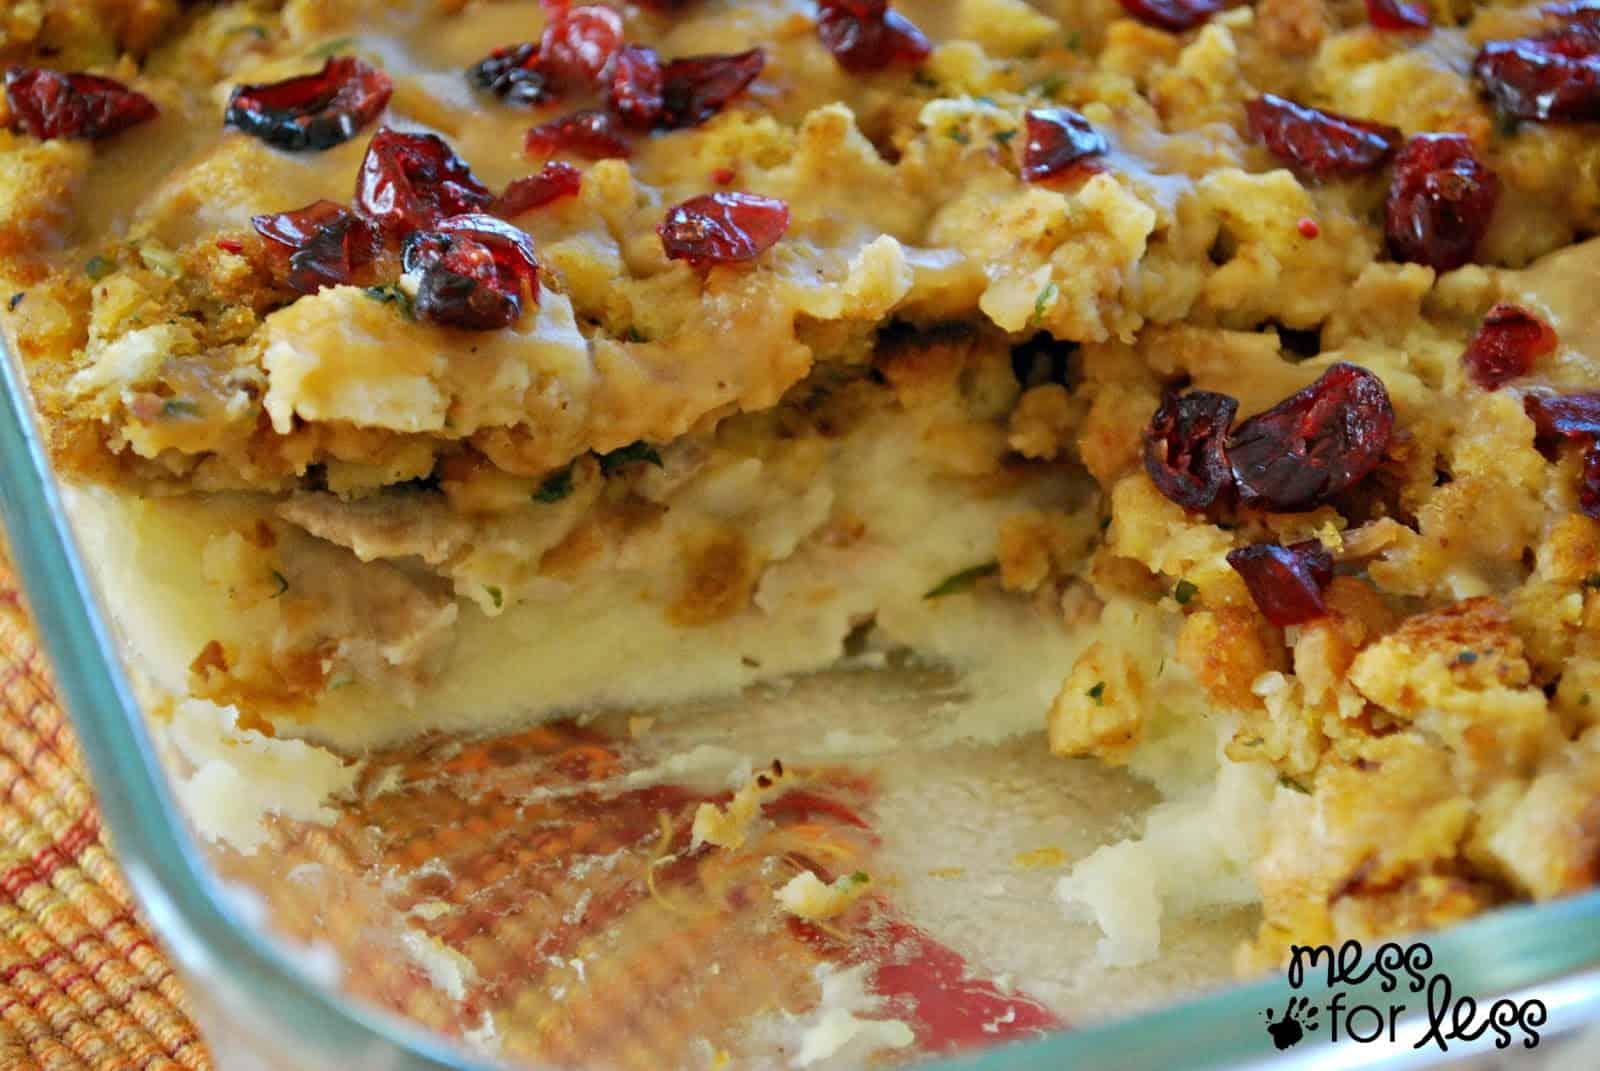 Thanksgiving dinner casserole mess for less for Leftover thanksgiving turkey recipes